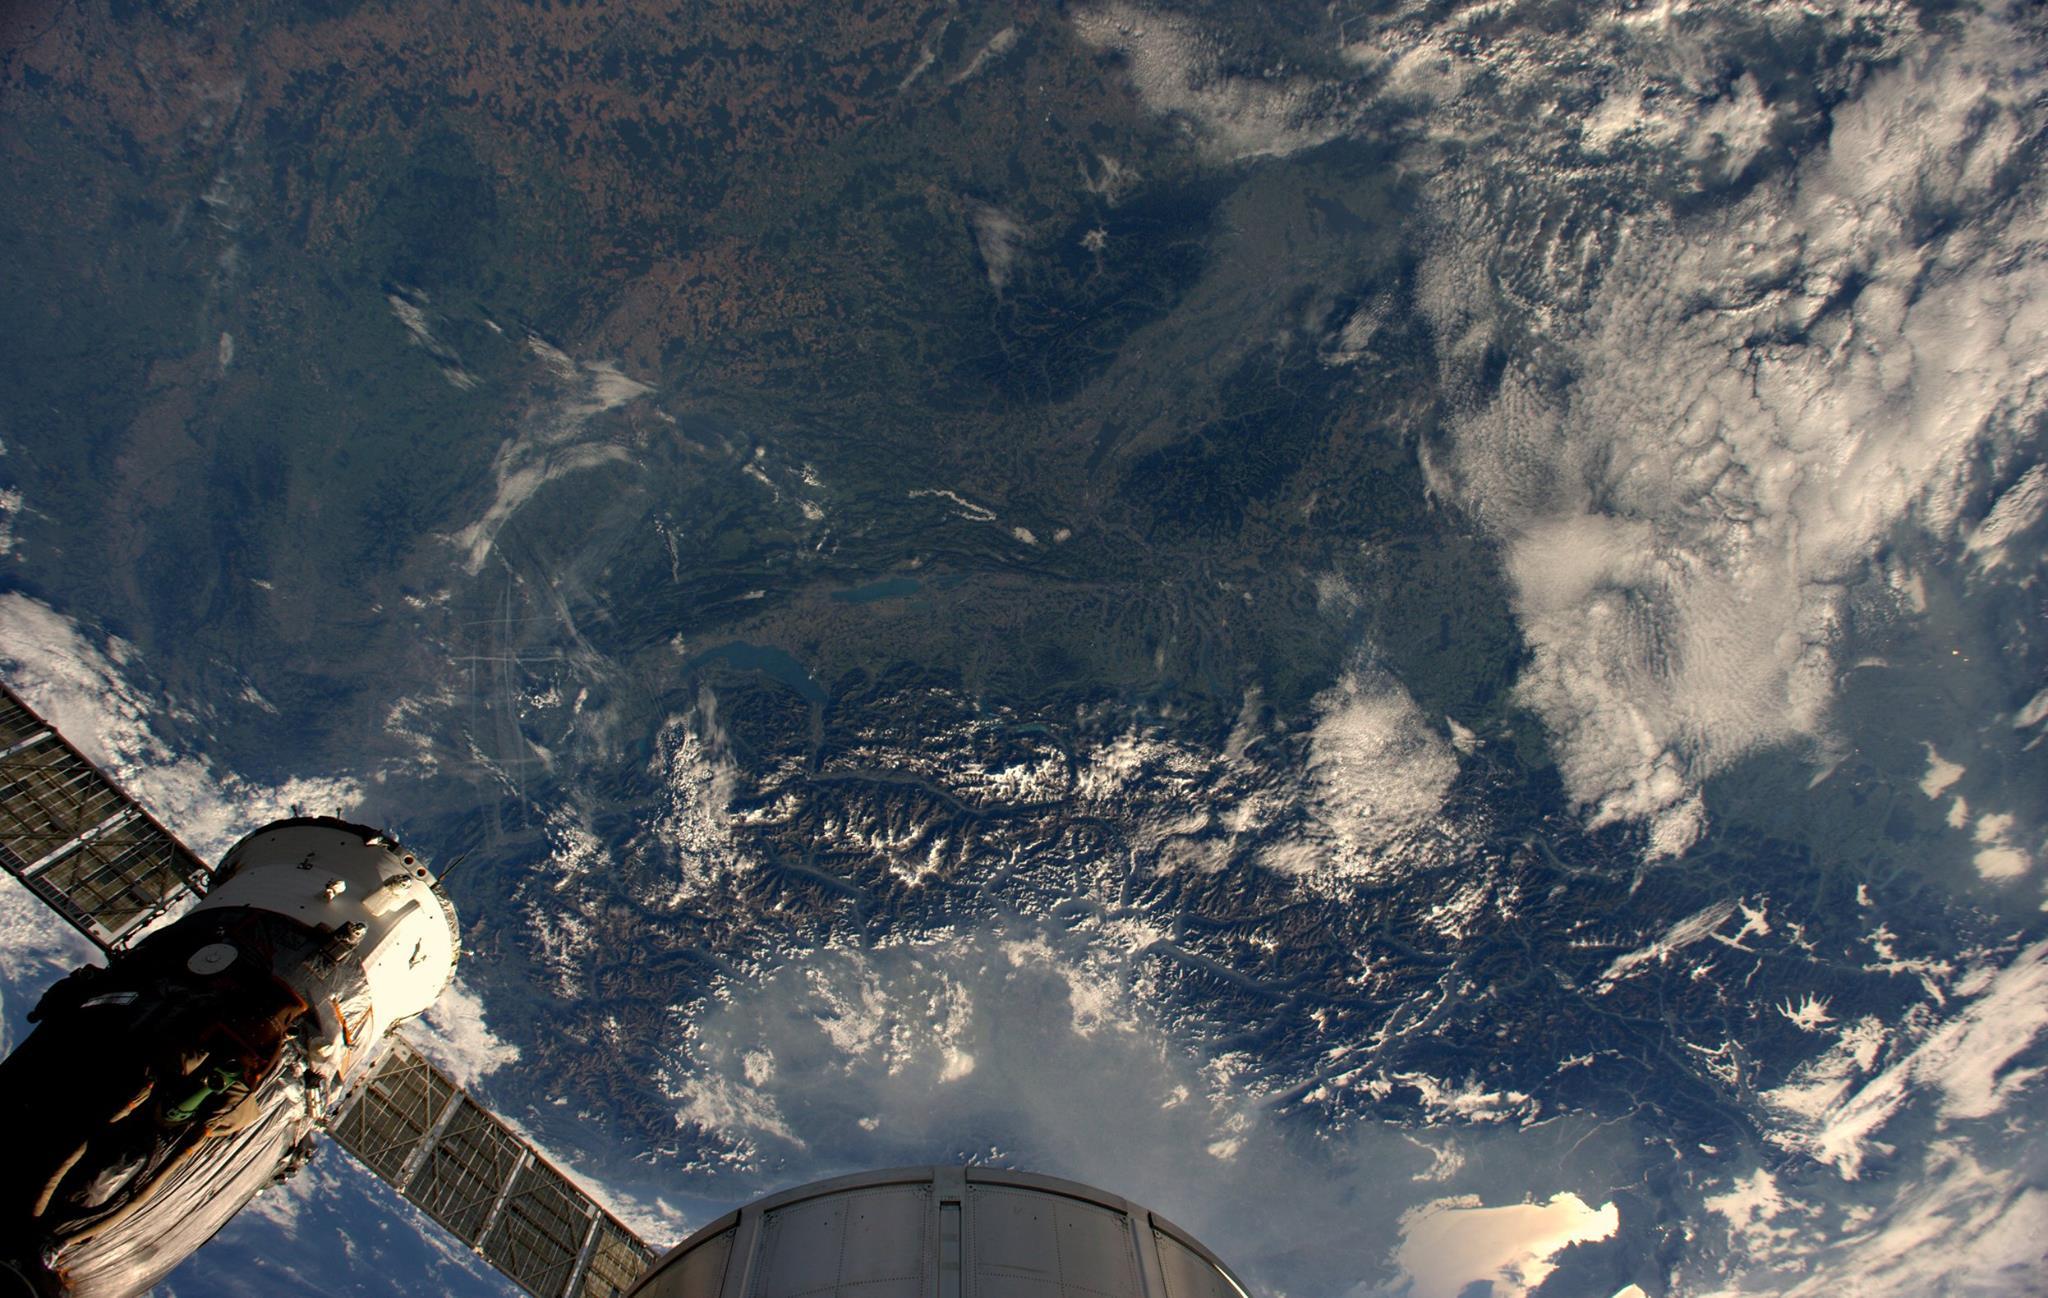 Photos astronaut Alexander Gerst 26